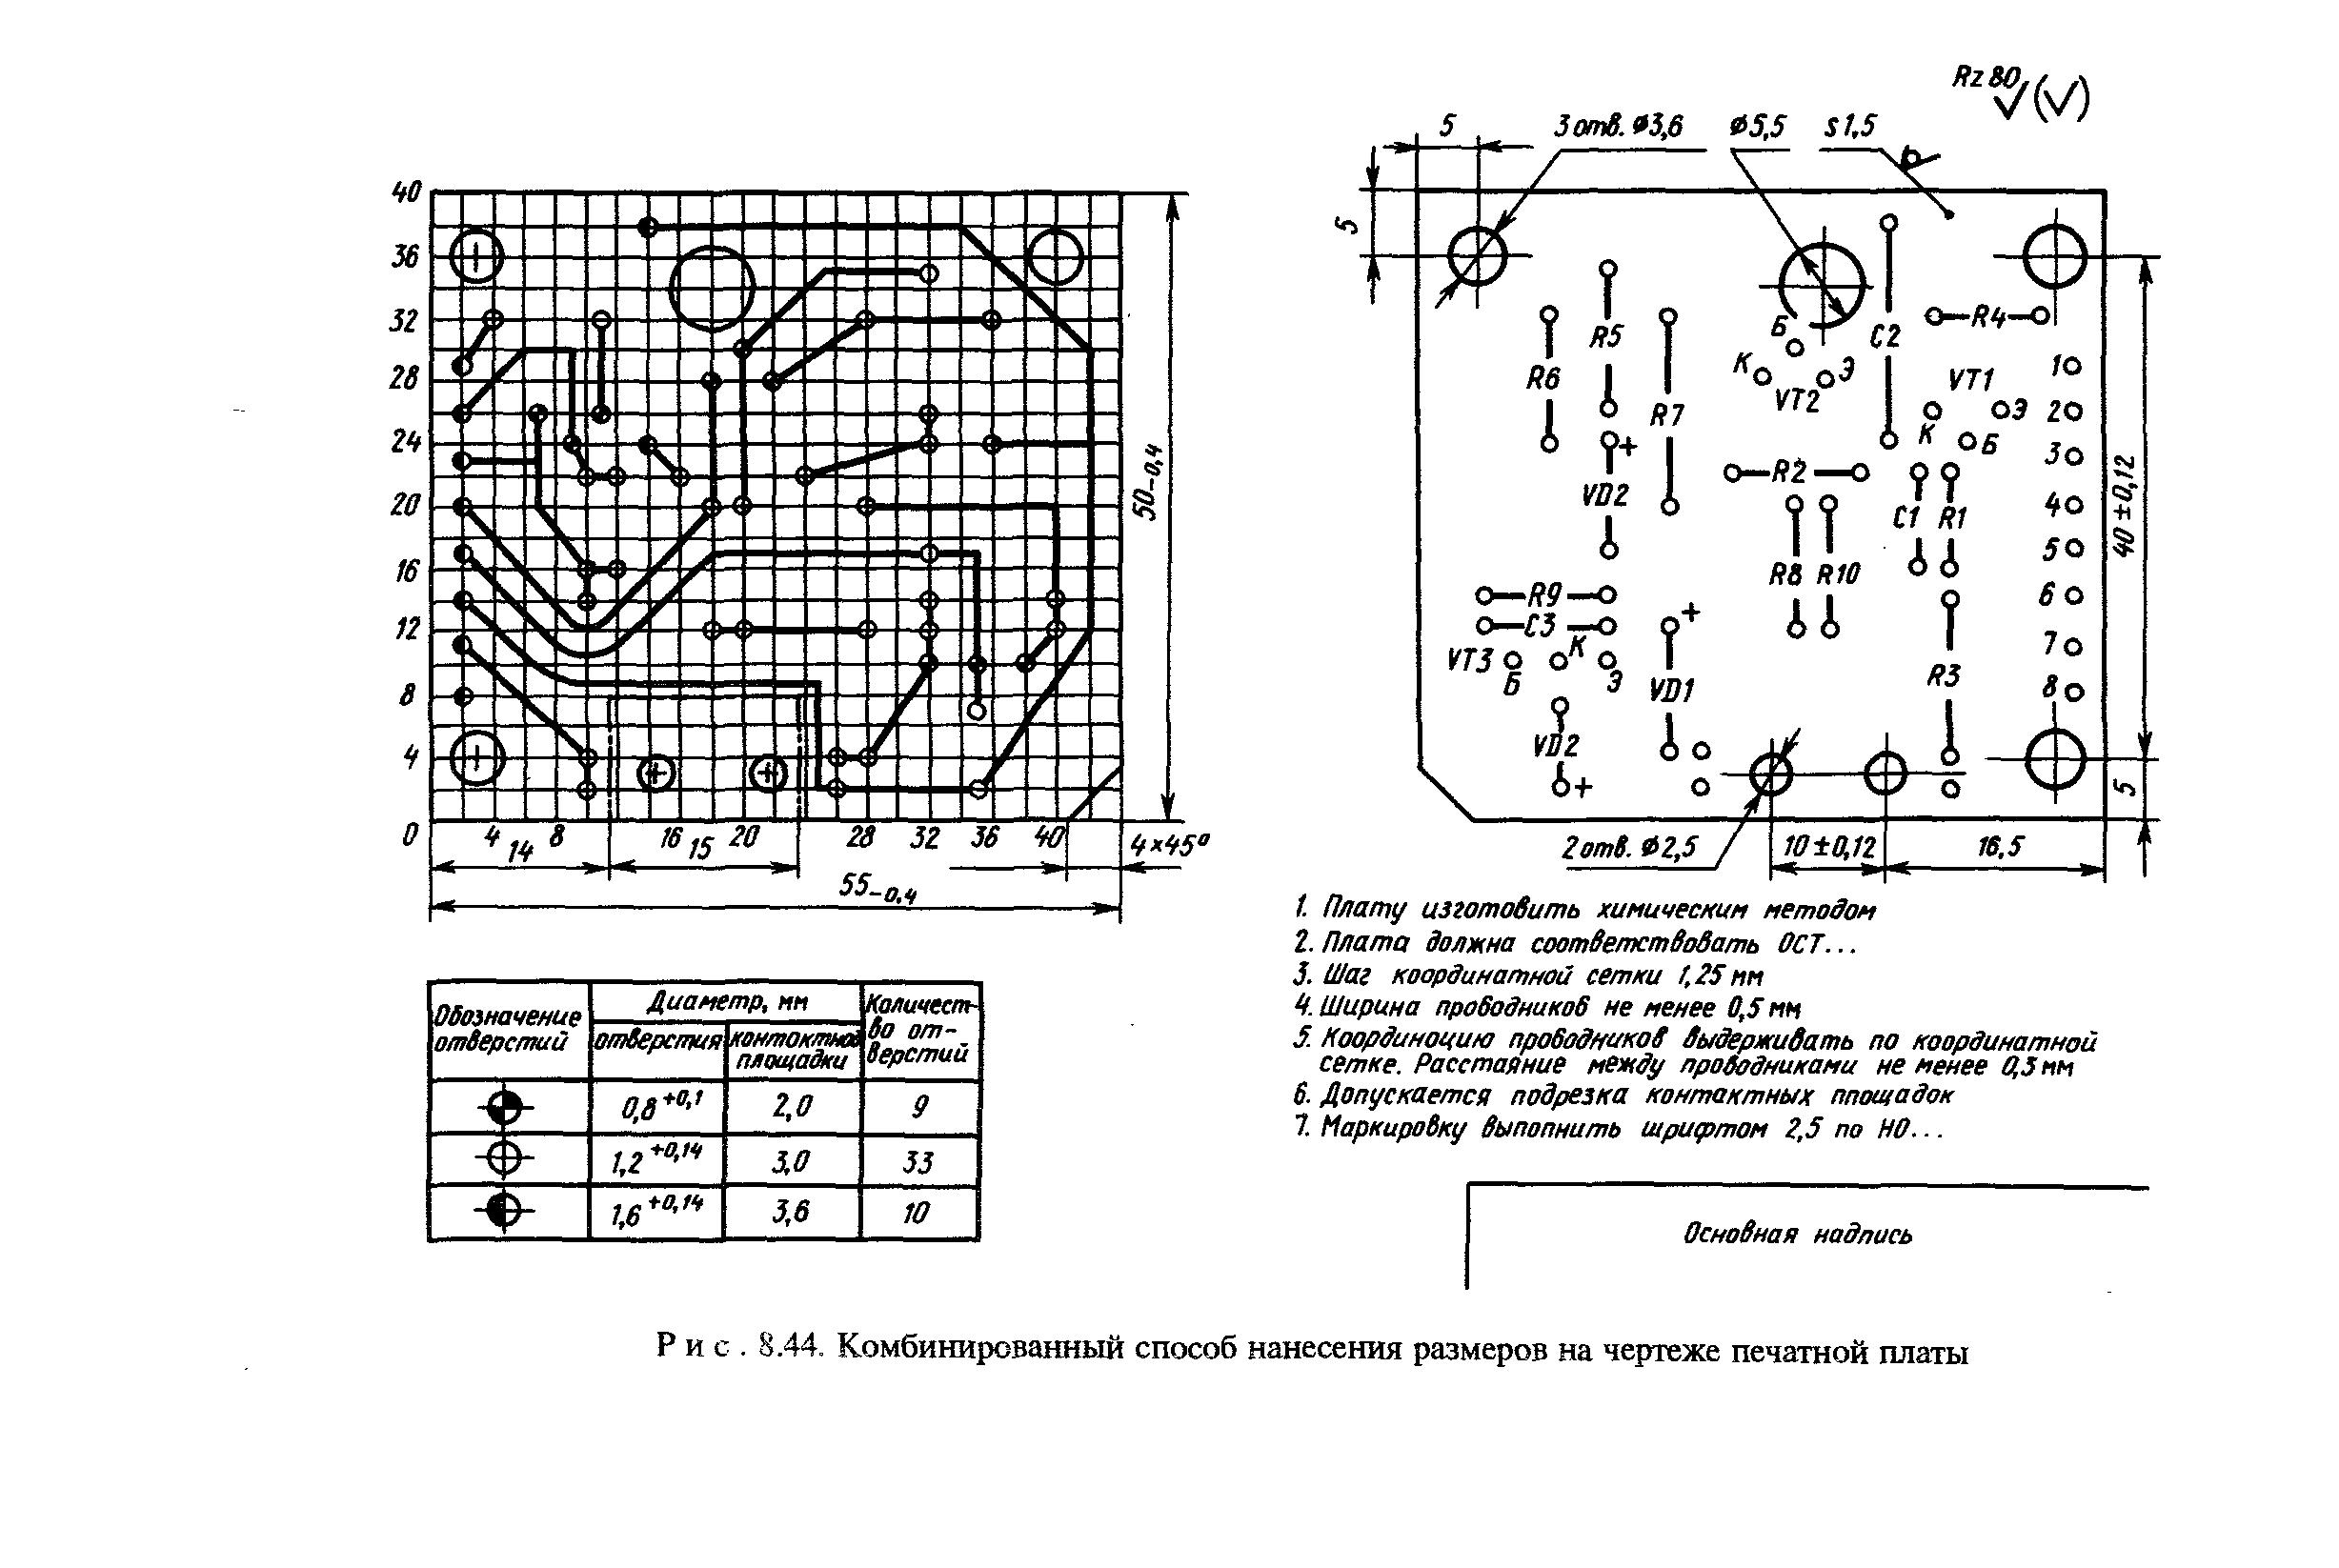 Гост 20406-75